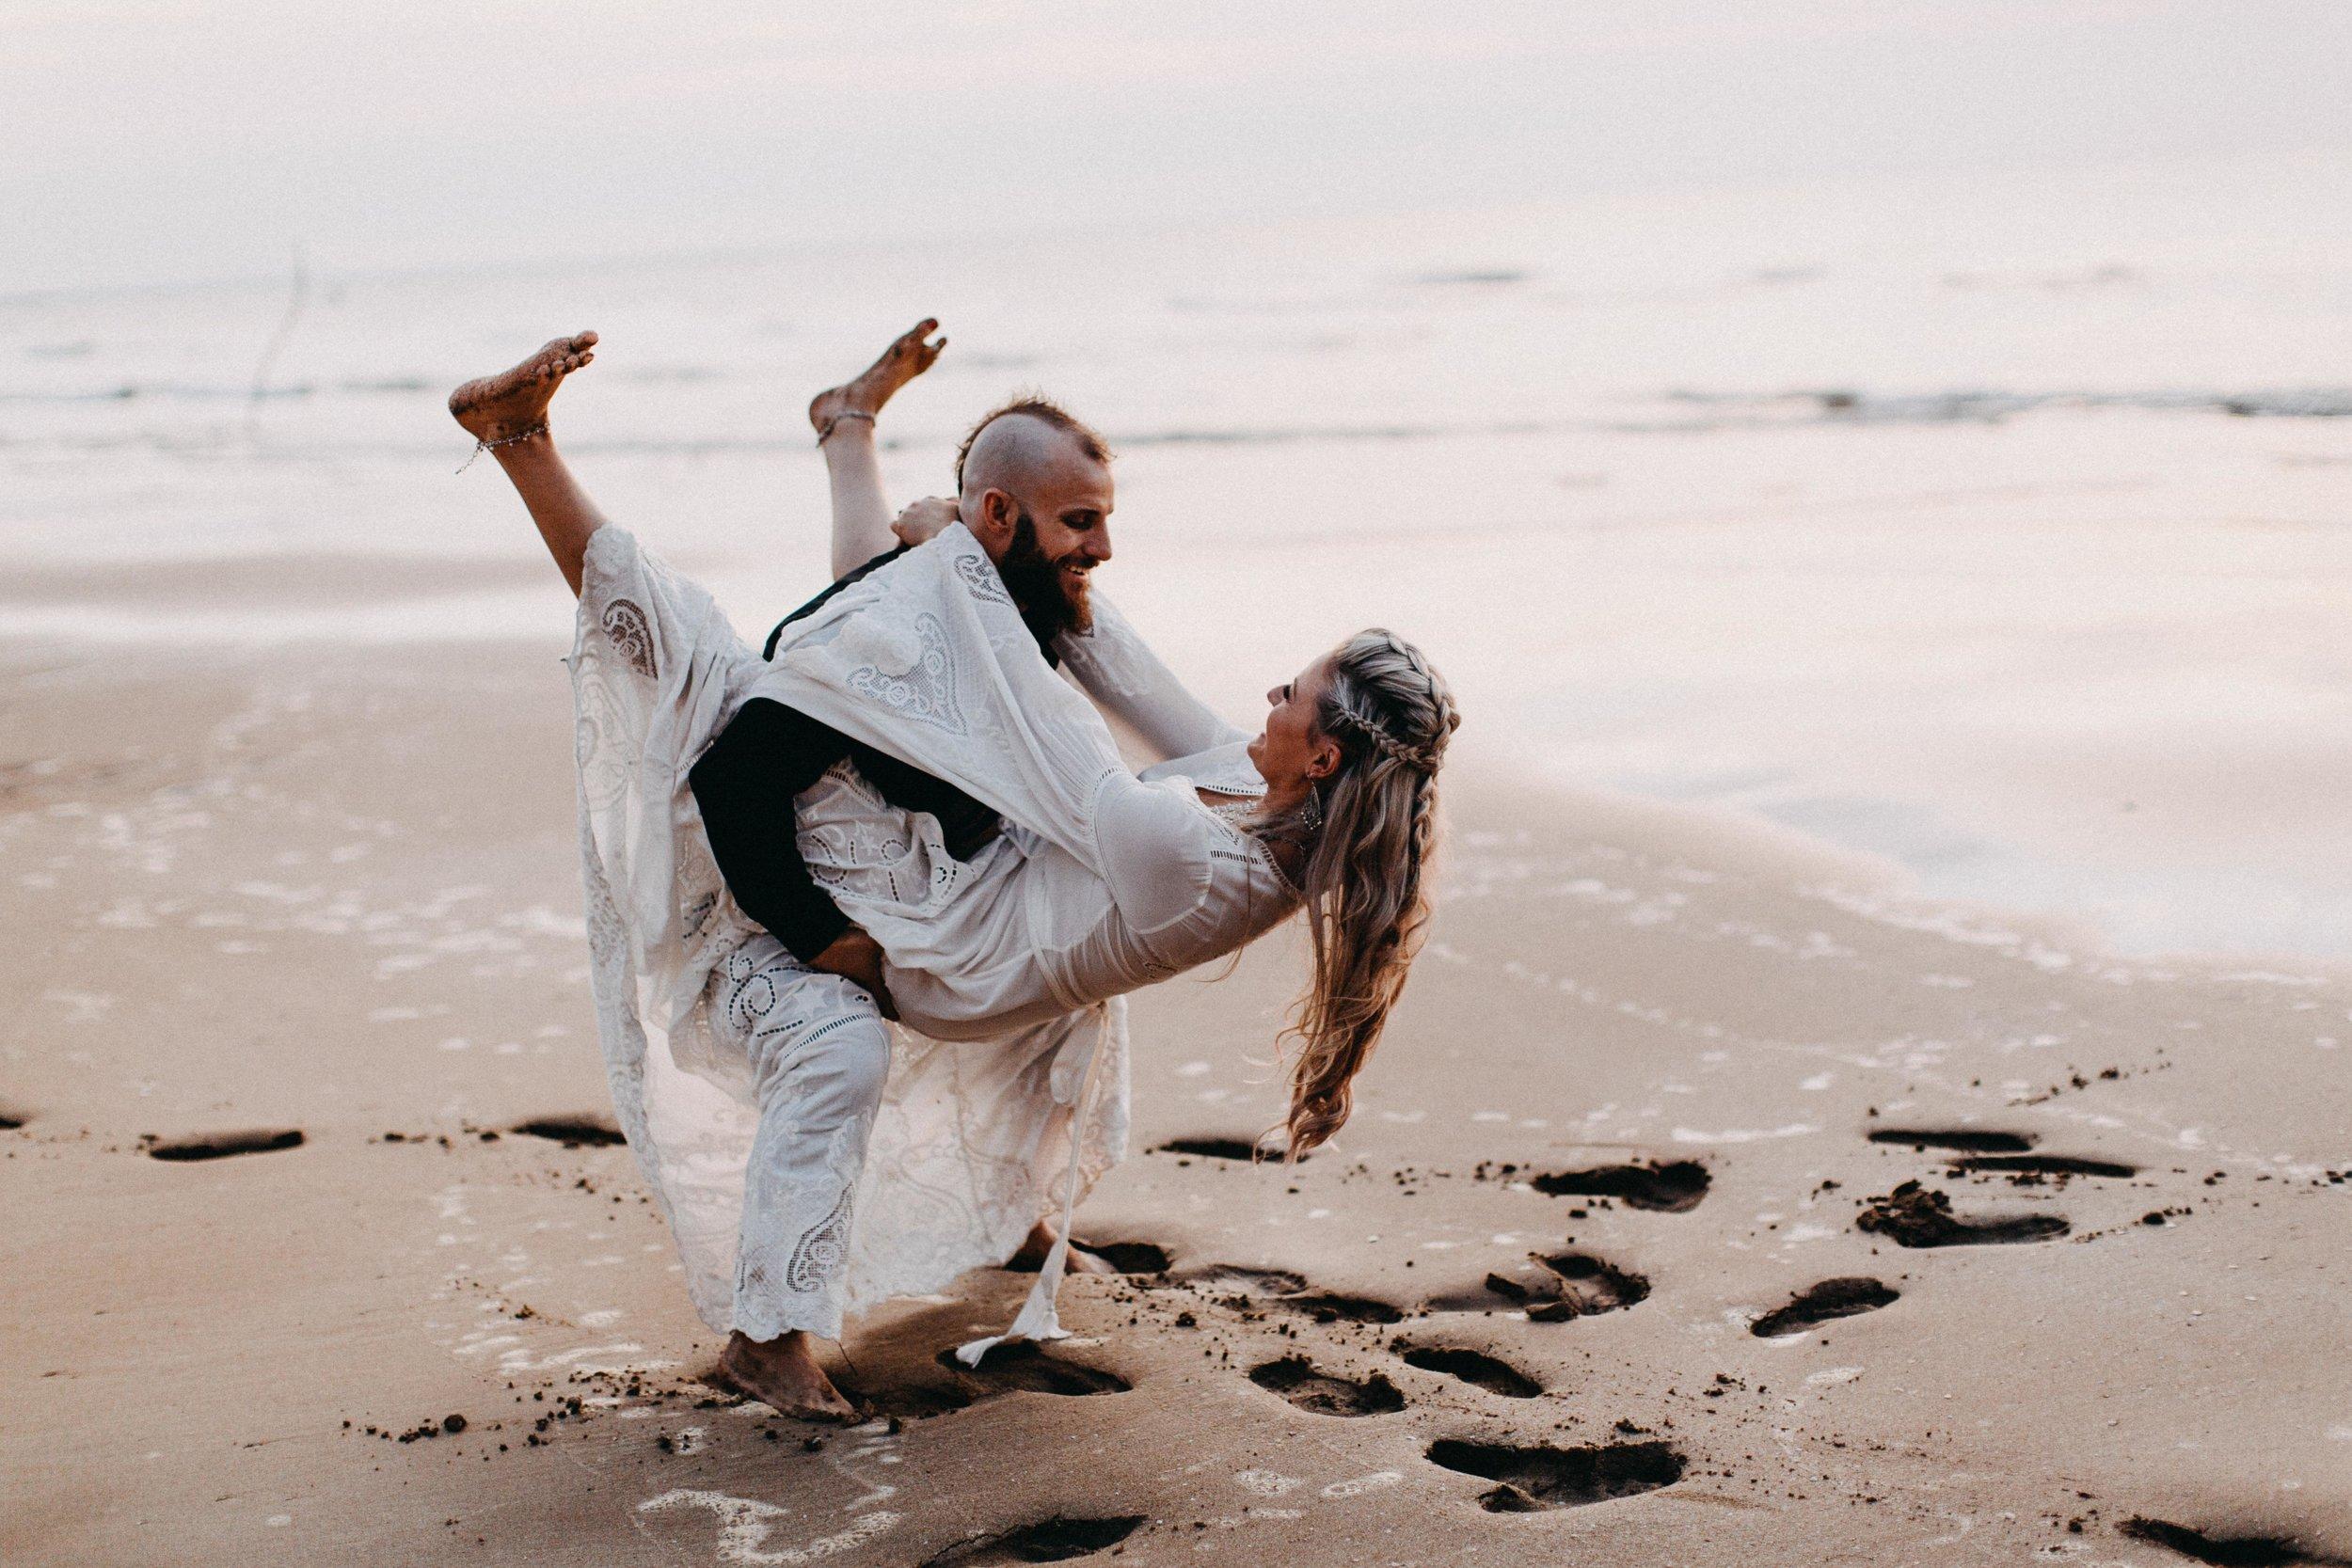 darwin-elopement-wedding-beach-camden-photography-www.emilyobrienphotography.net-96.jpg